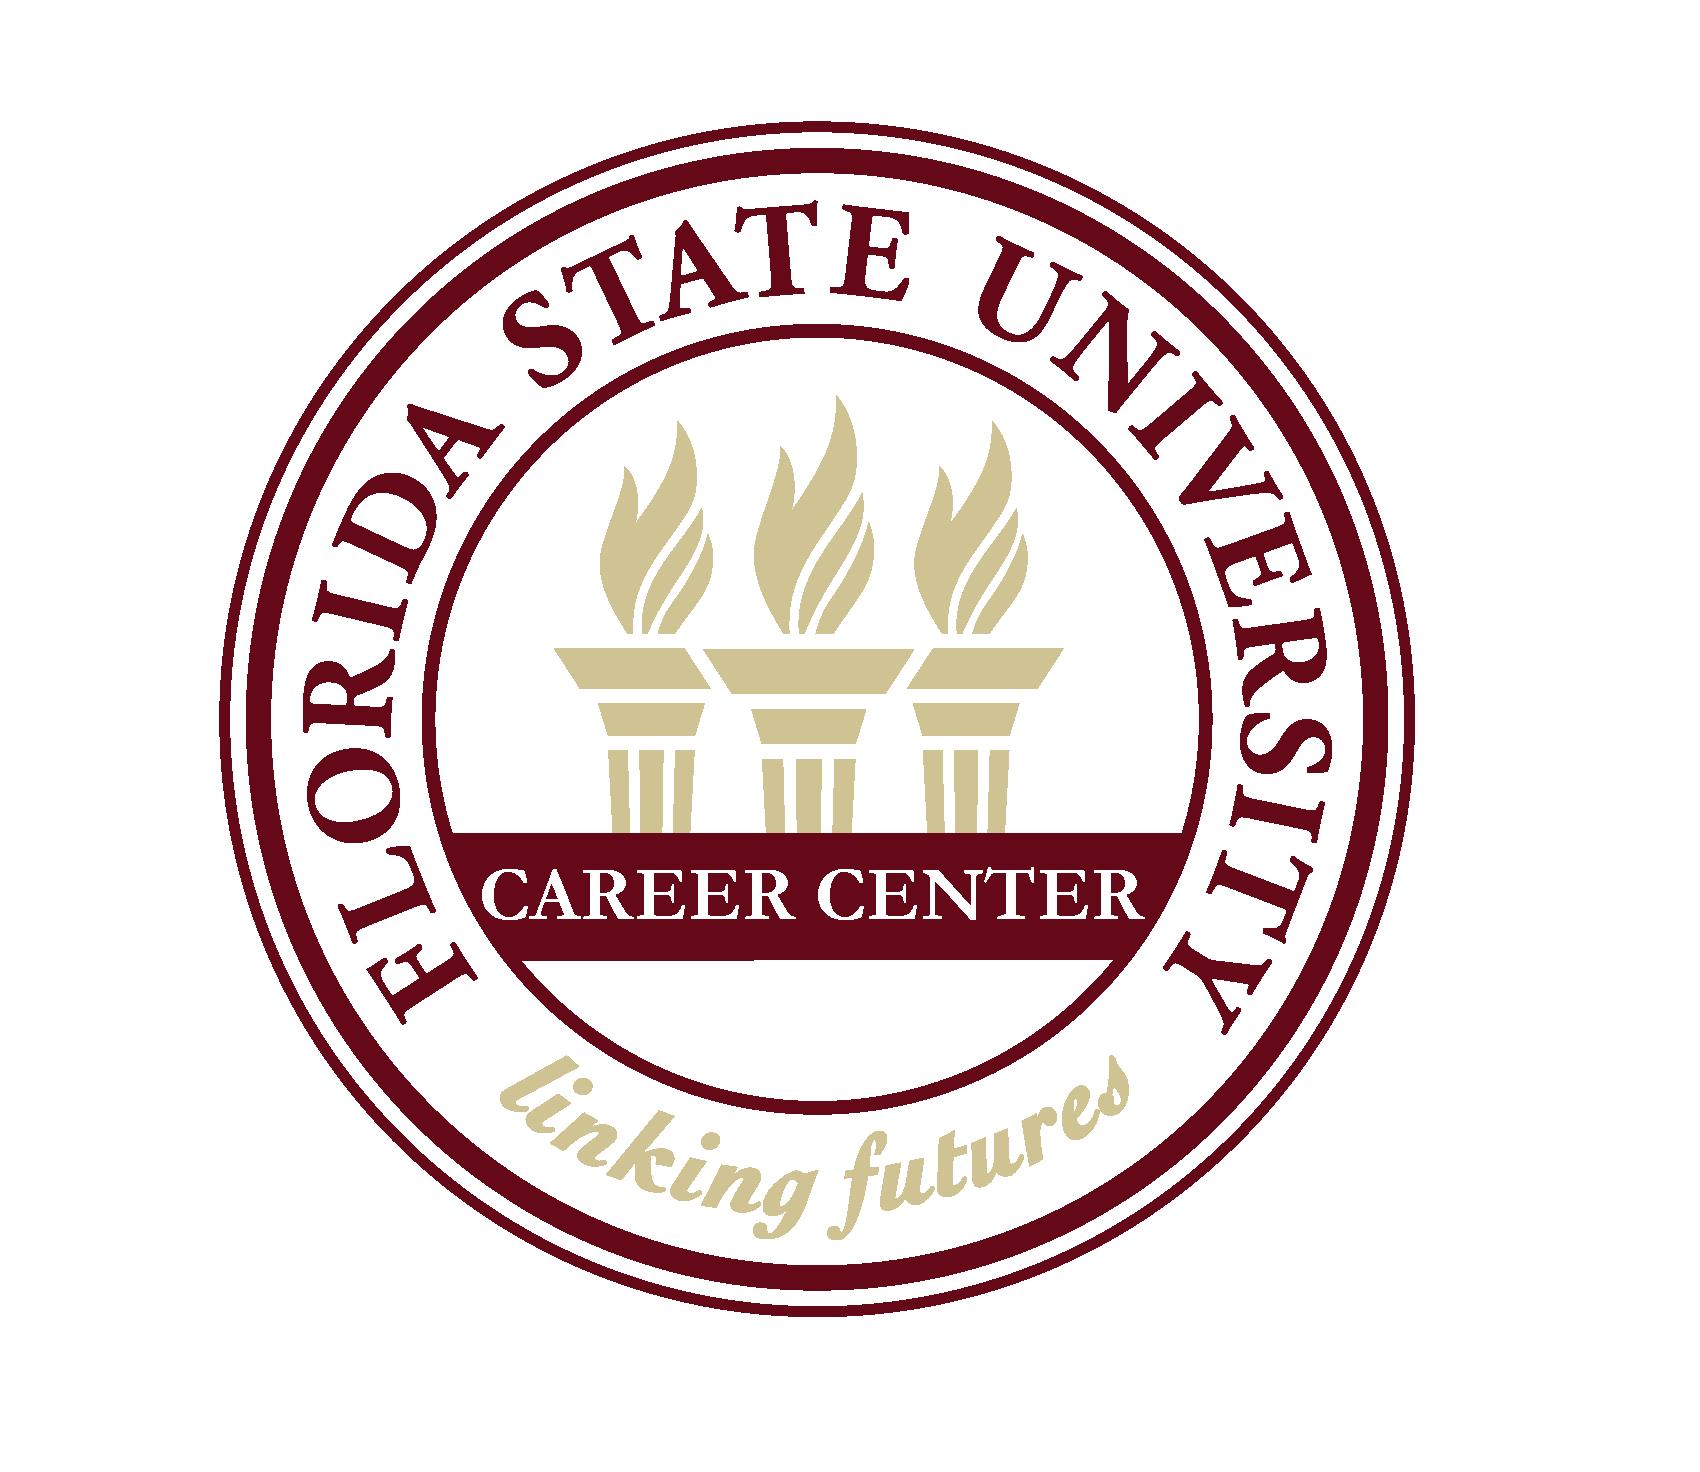 FSU Career Center